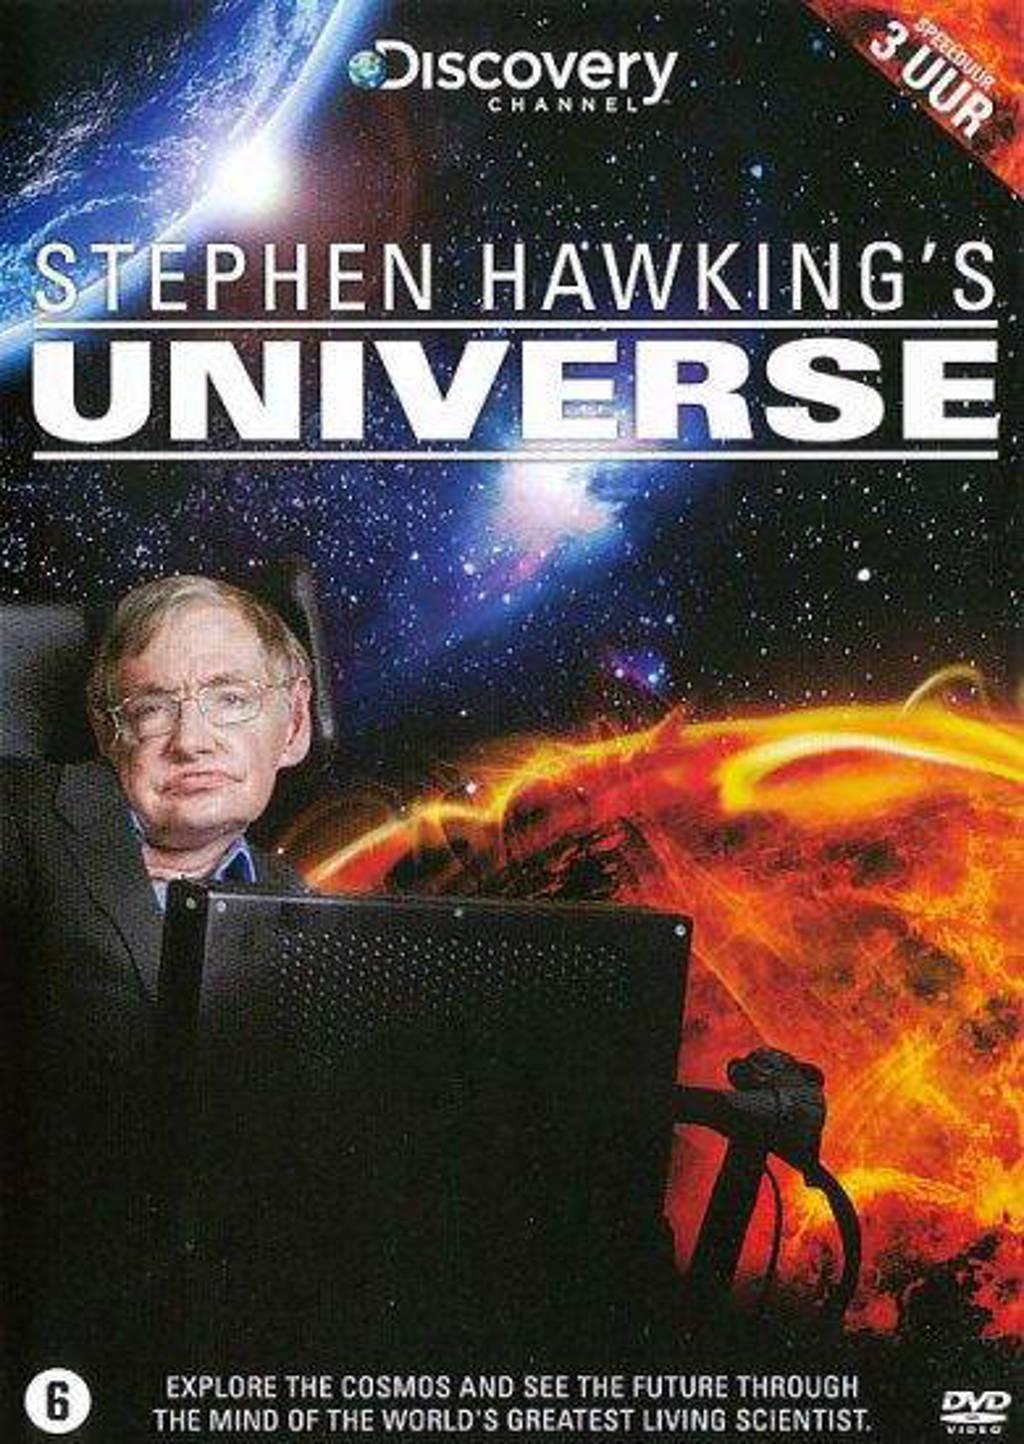 Stephen Hawking's universe (DVD)